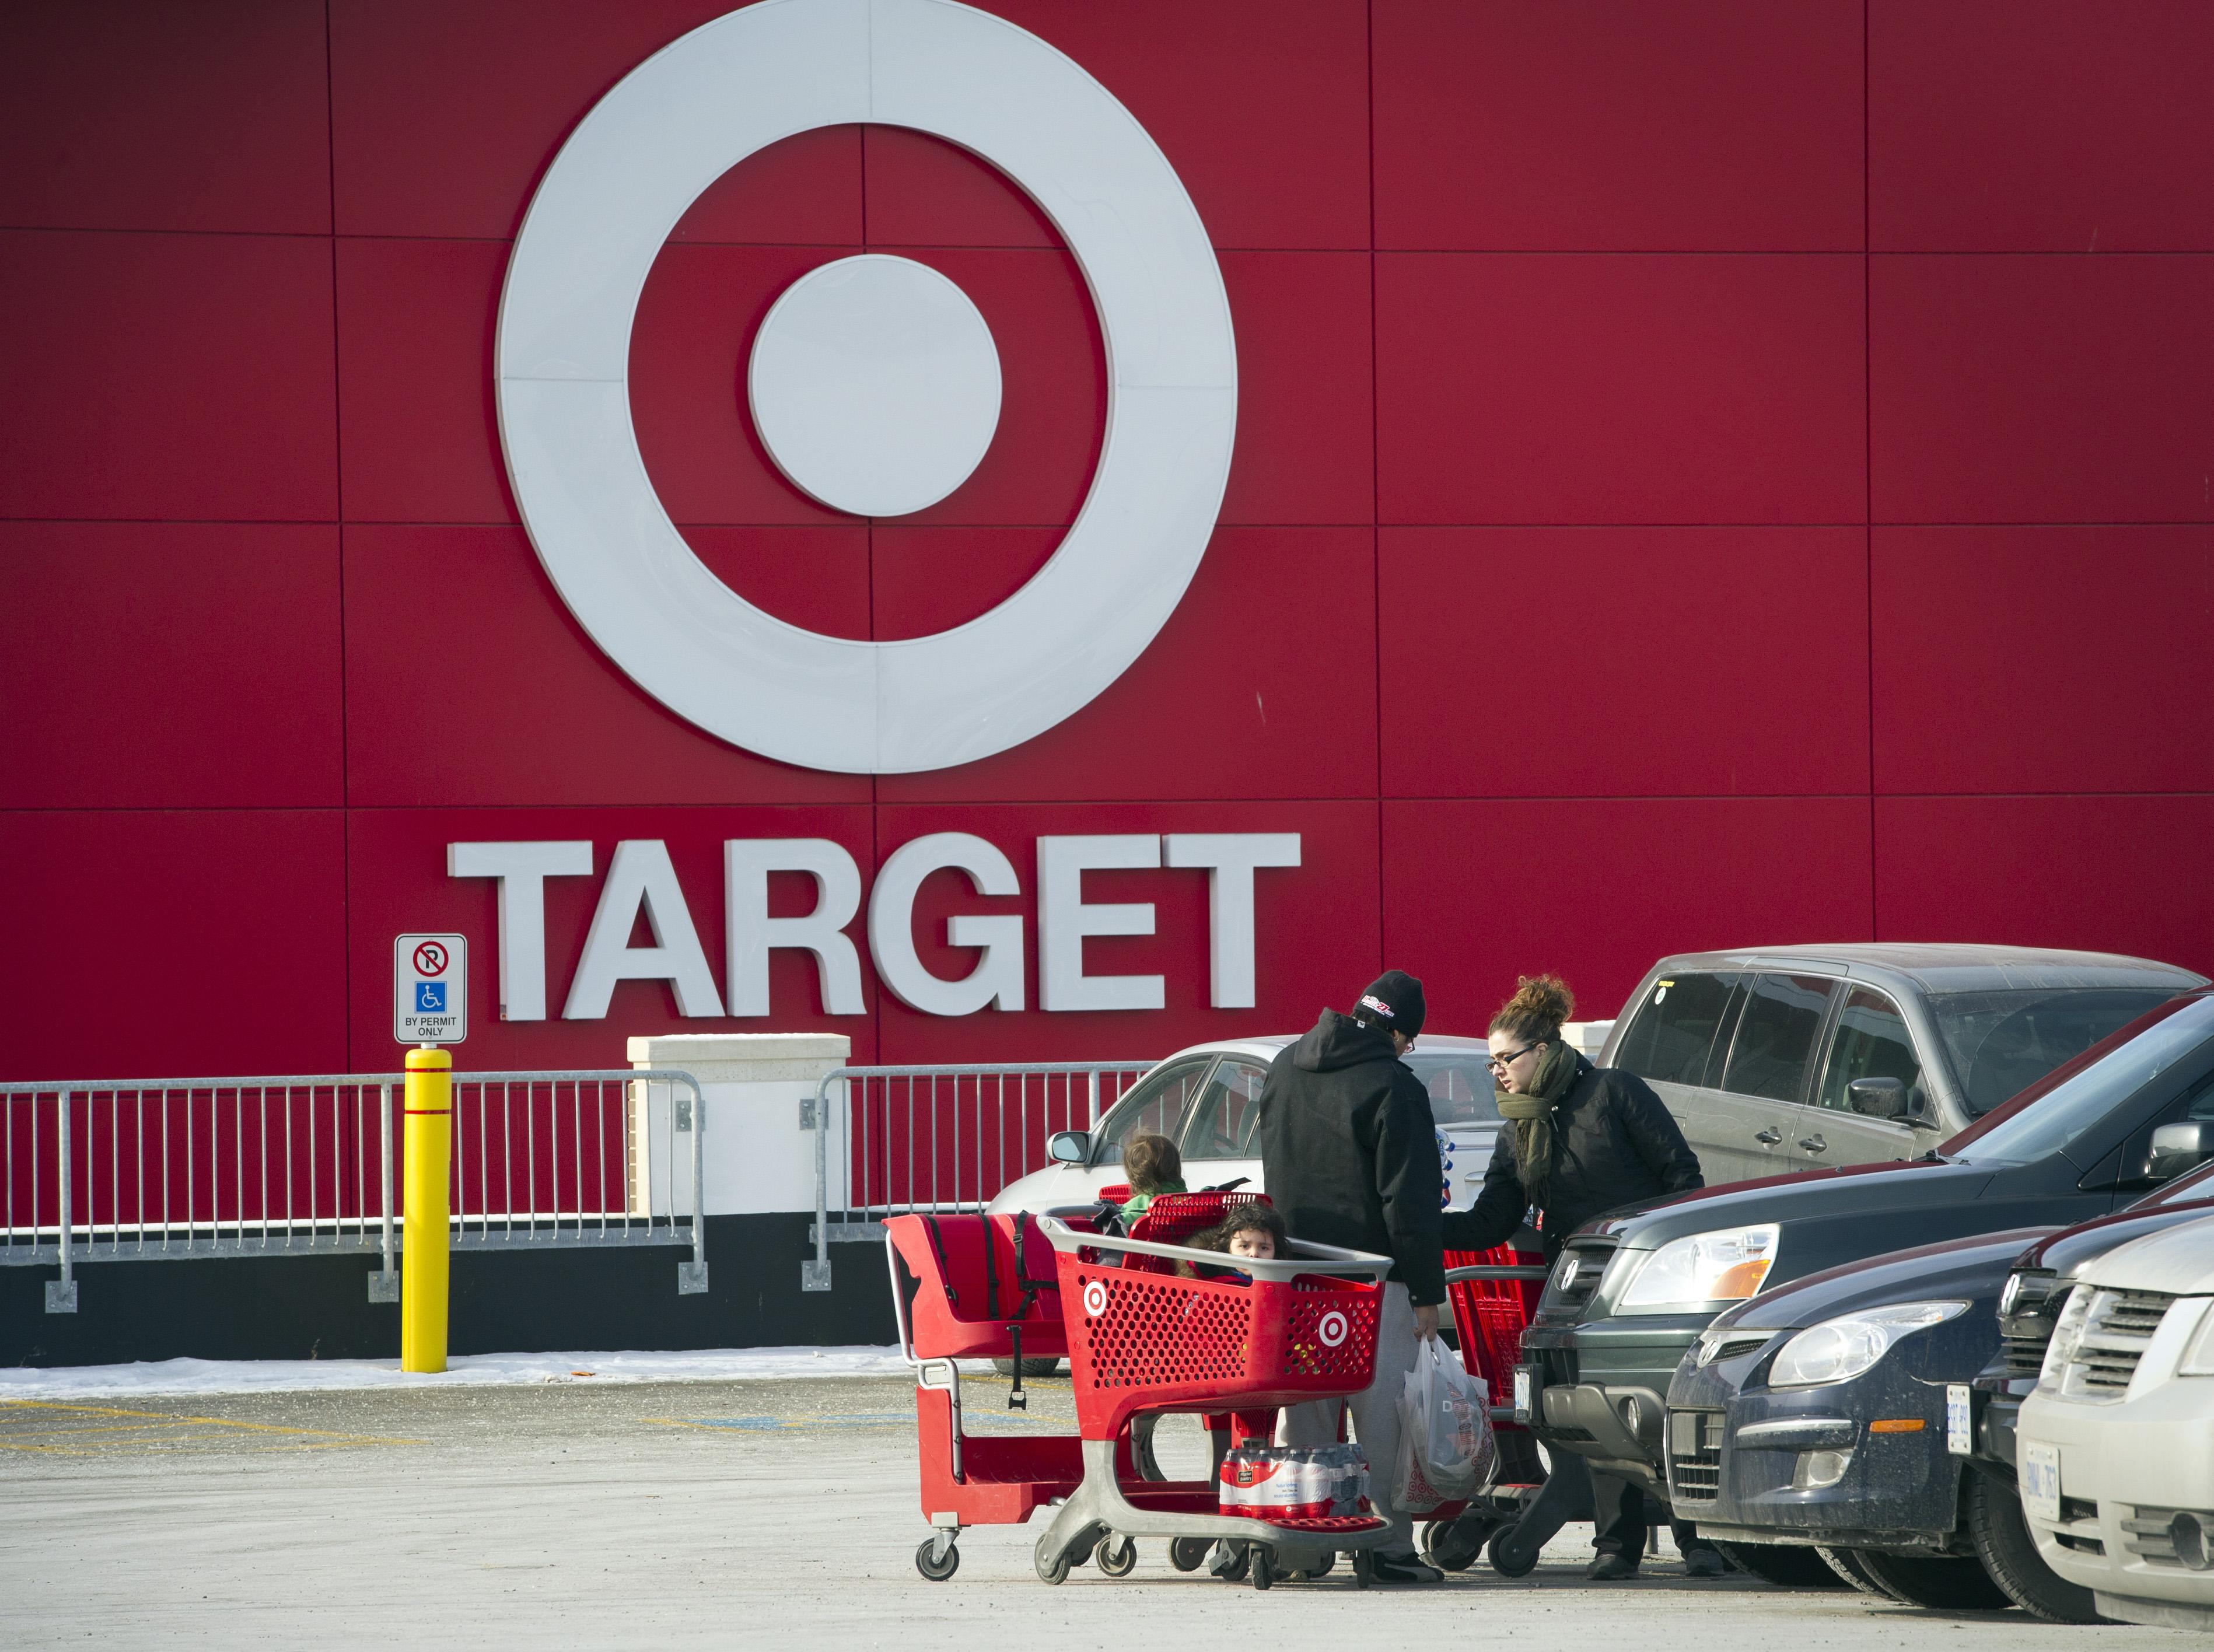 Target, no vendera, sacara, marcas, merona, mossimo, cherokee, nuevas lineas, otono,